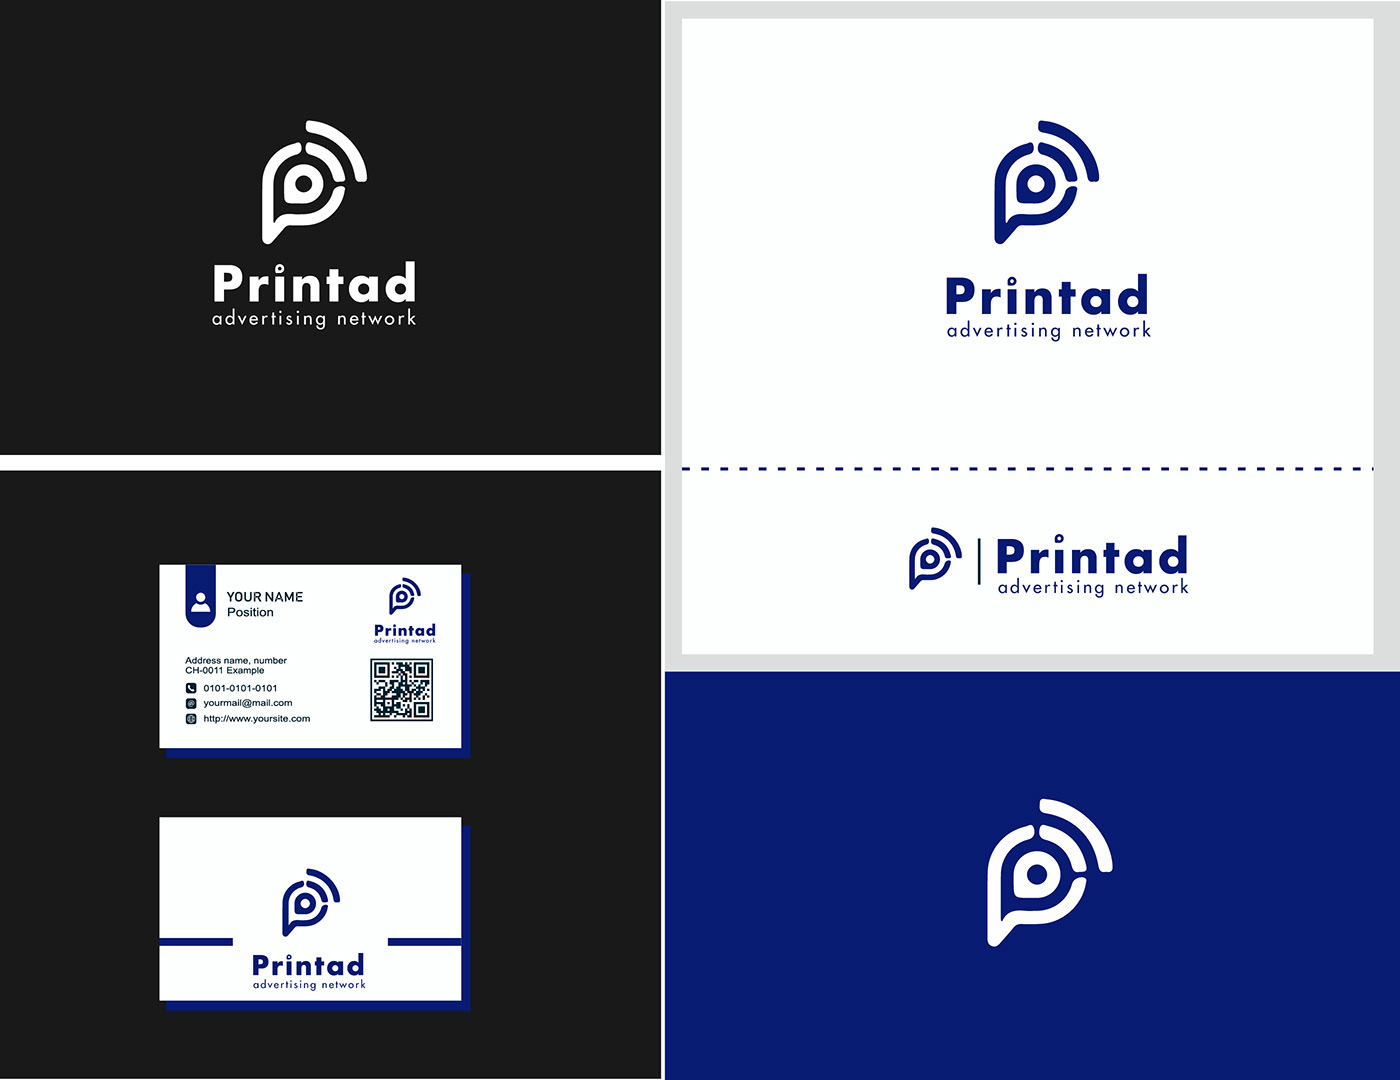 #fontPlogo #Logo #logoideas #logomaker #logotype  #P #plogo #Printad #Professional famebromedia